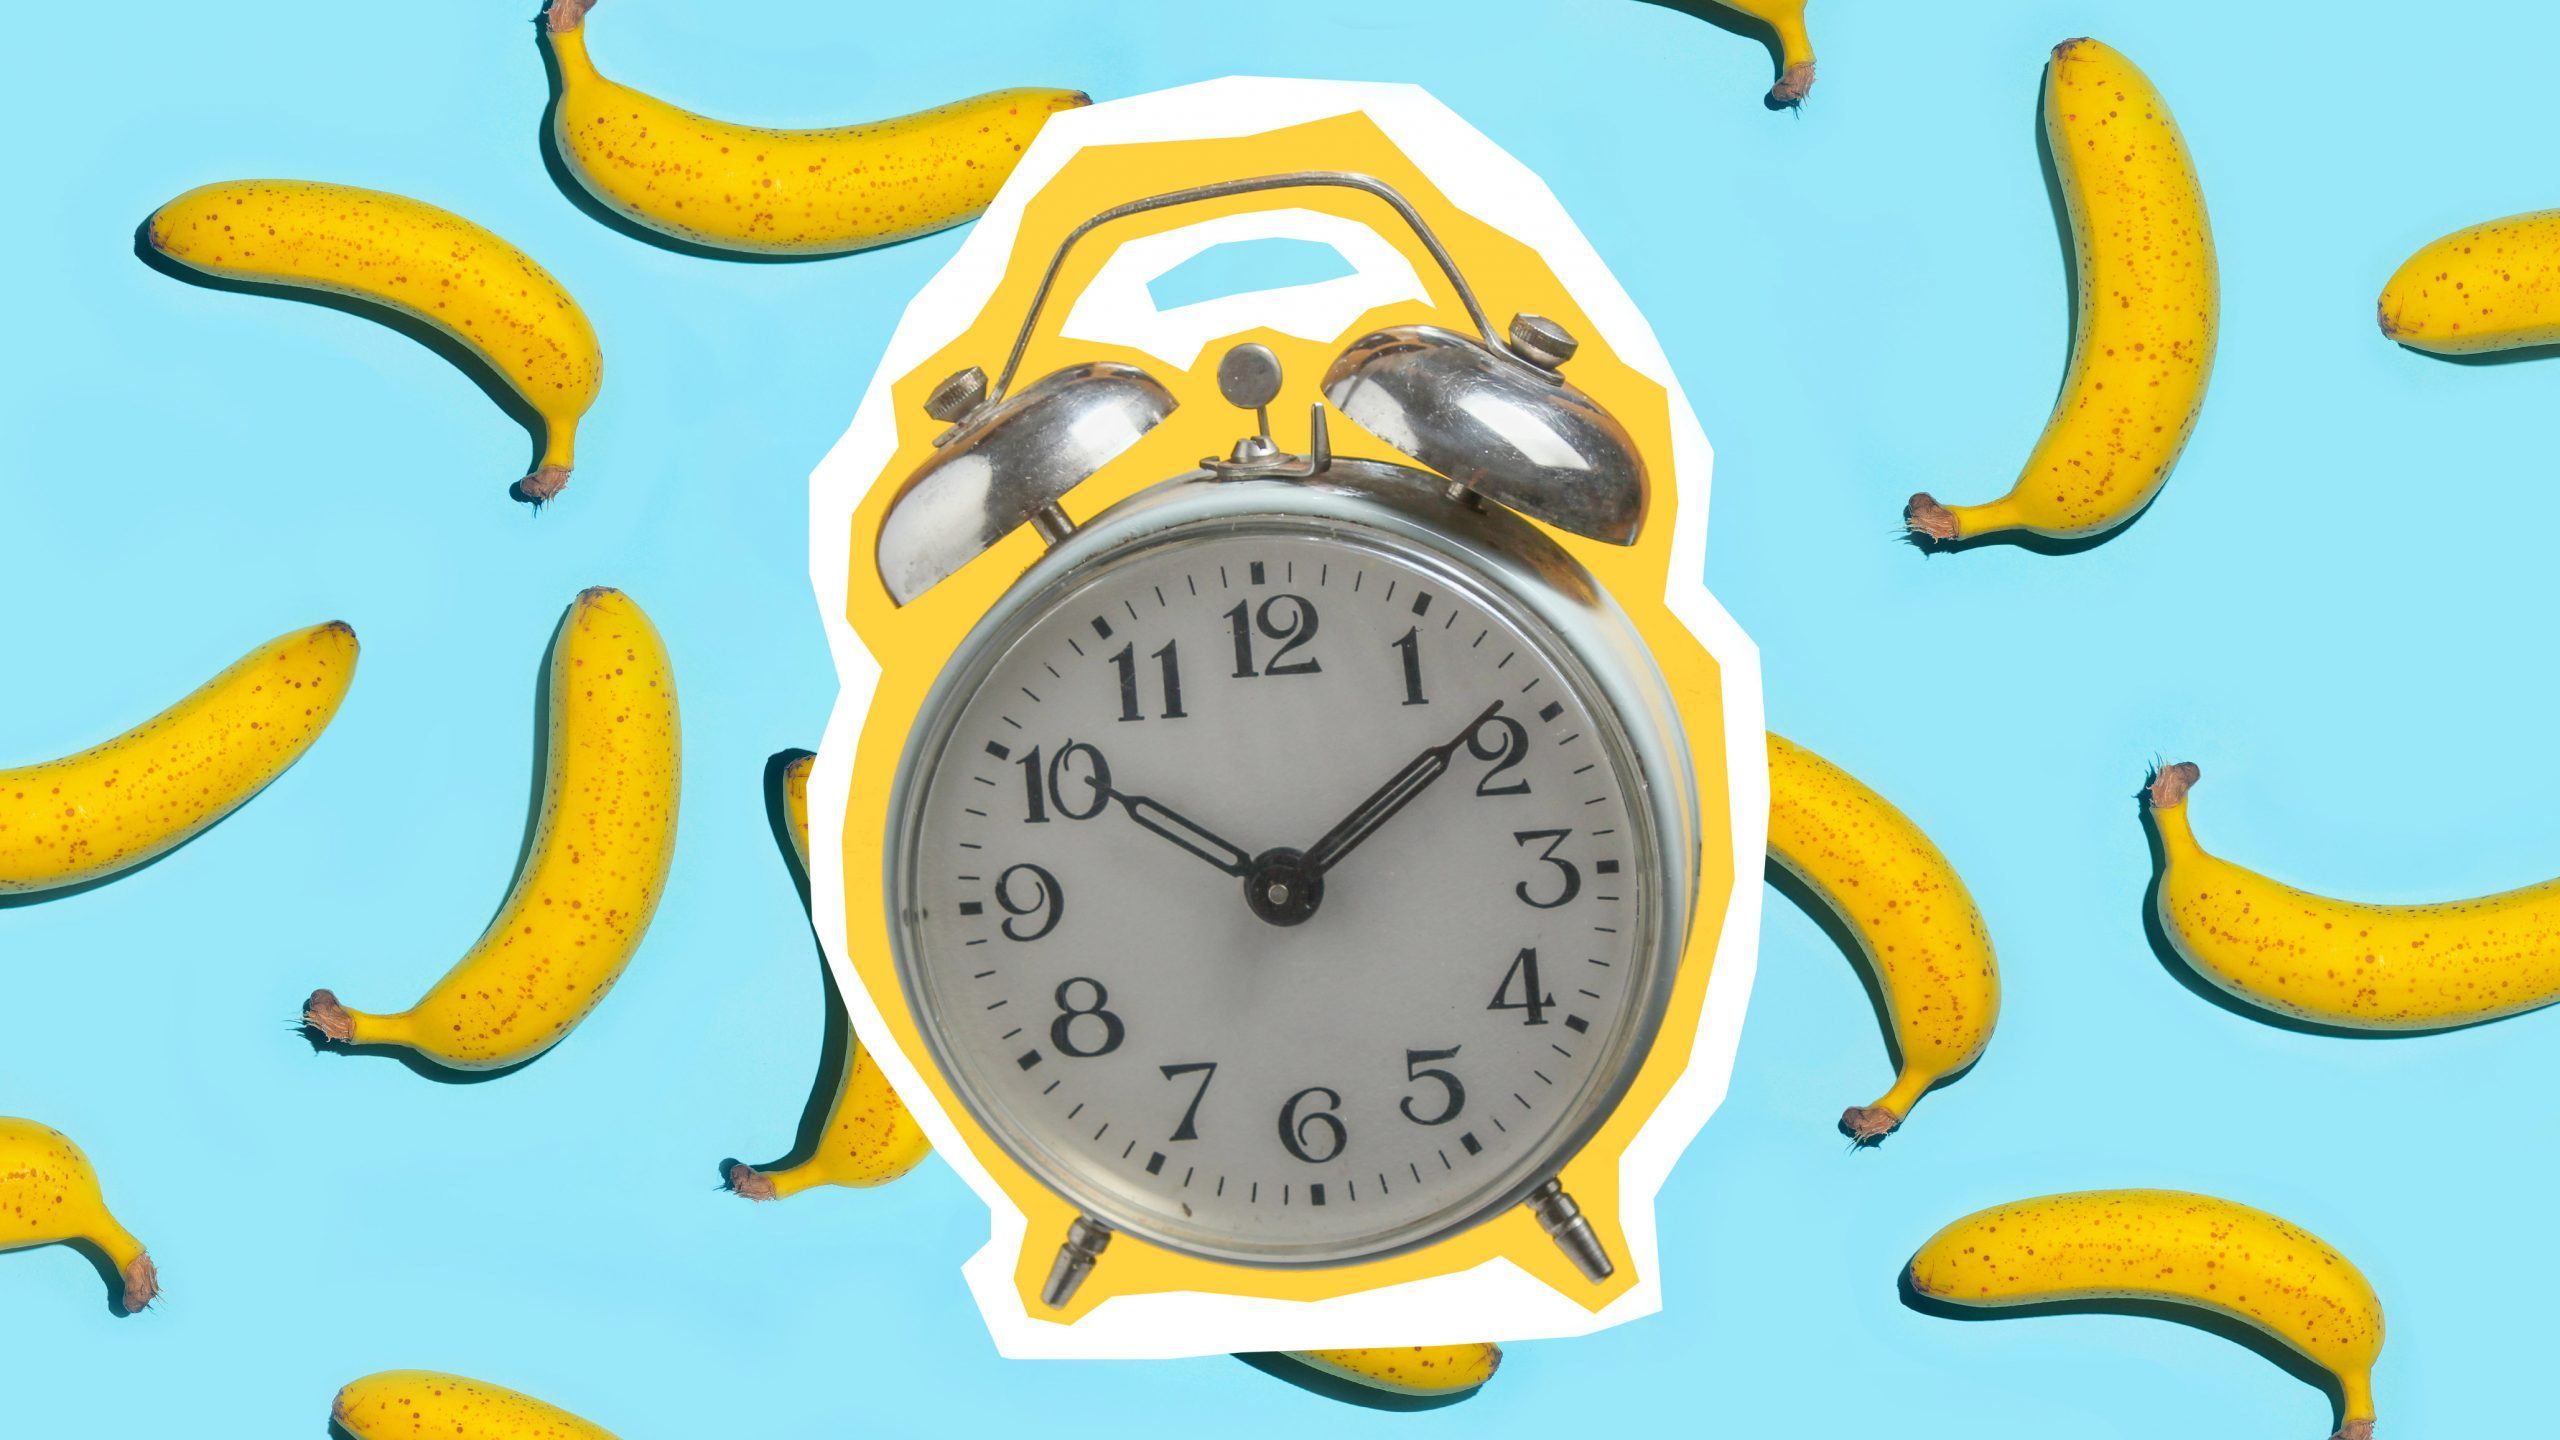 Zine style, pop art design. Creative collage with retro style alarm and bananas